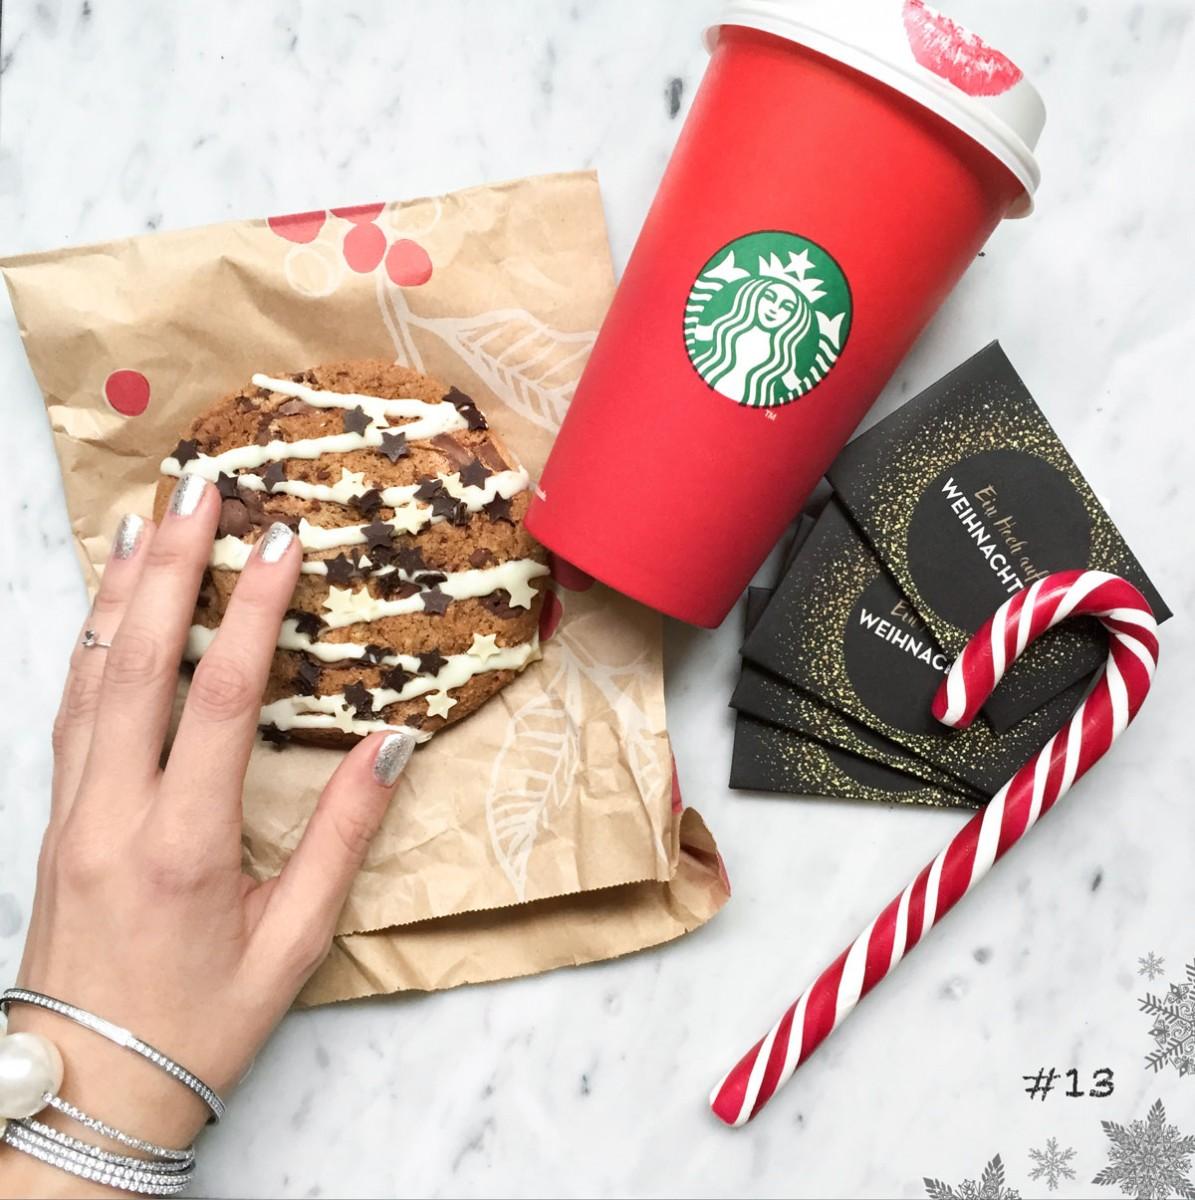 Blogger Adventskalender 2015 II How I met my outfit by Dana Lohmüller  II 100 € Starbucks Gutschein